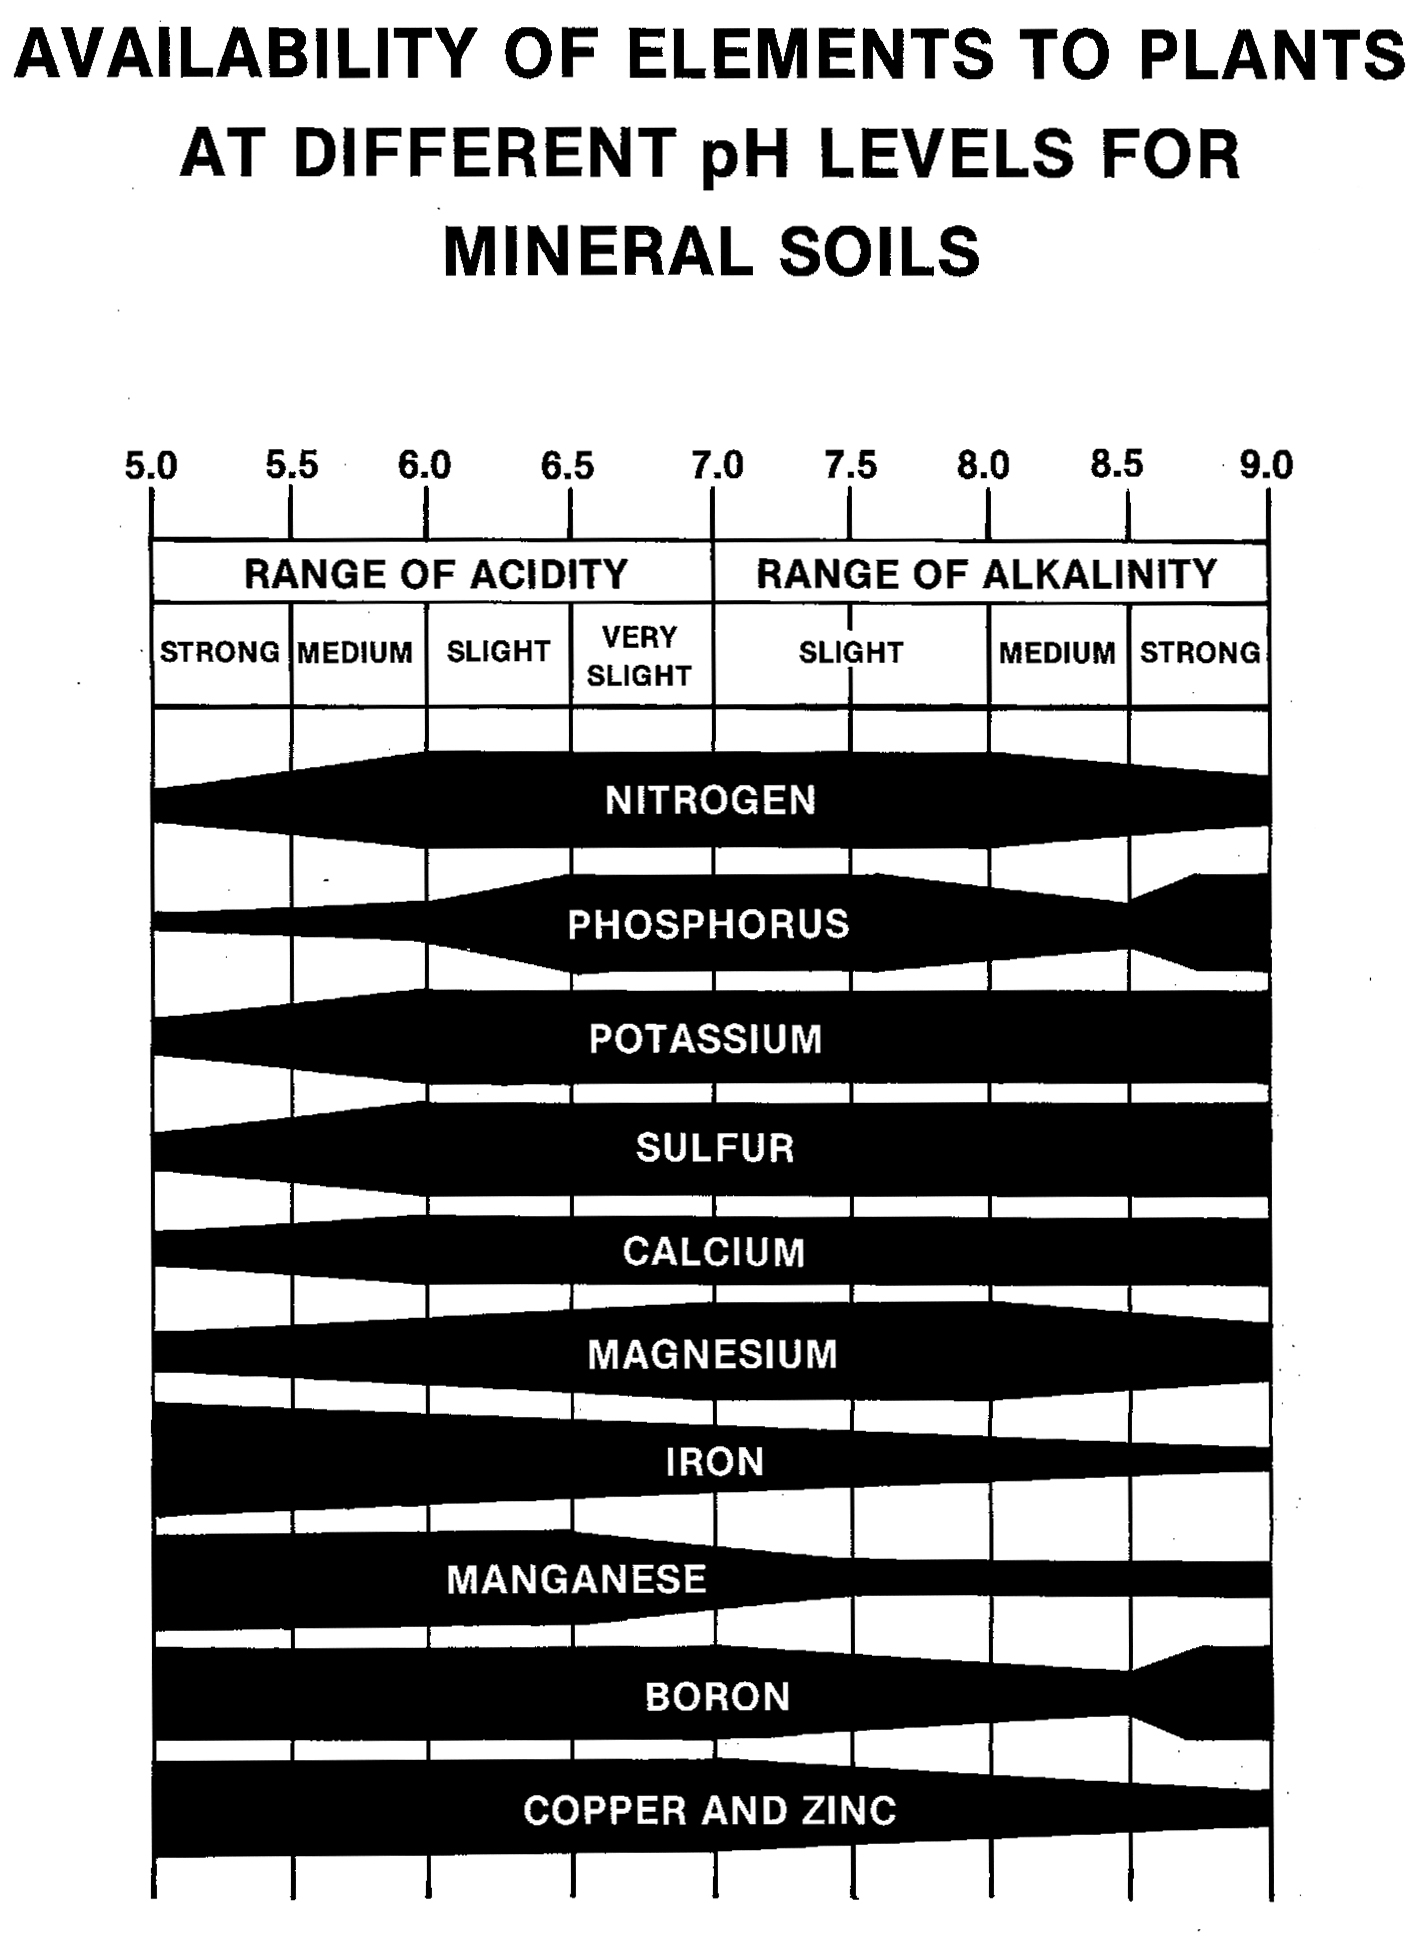 nutrient_availability_soil_ph_mineral_soils.jpg